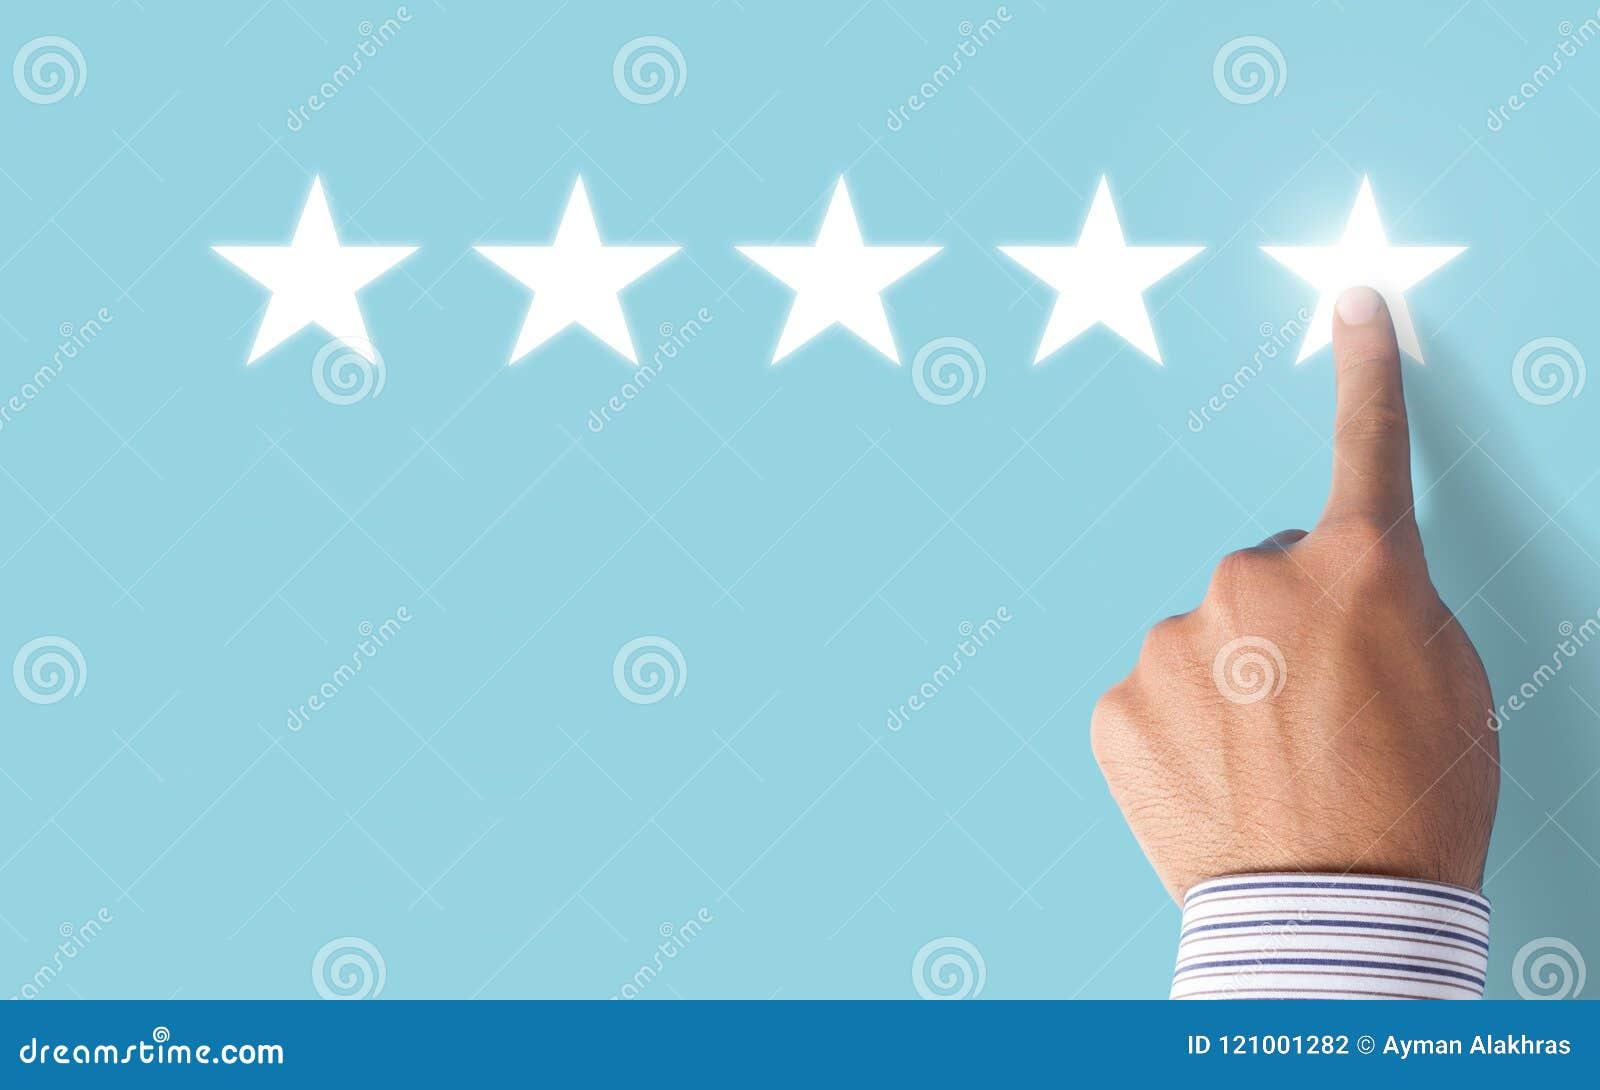 Hand choosing 5 stars rating on blue background - Positive feedback